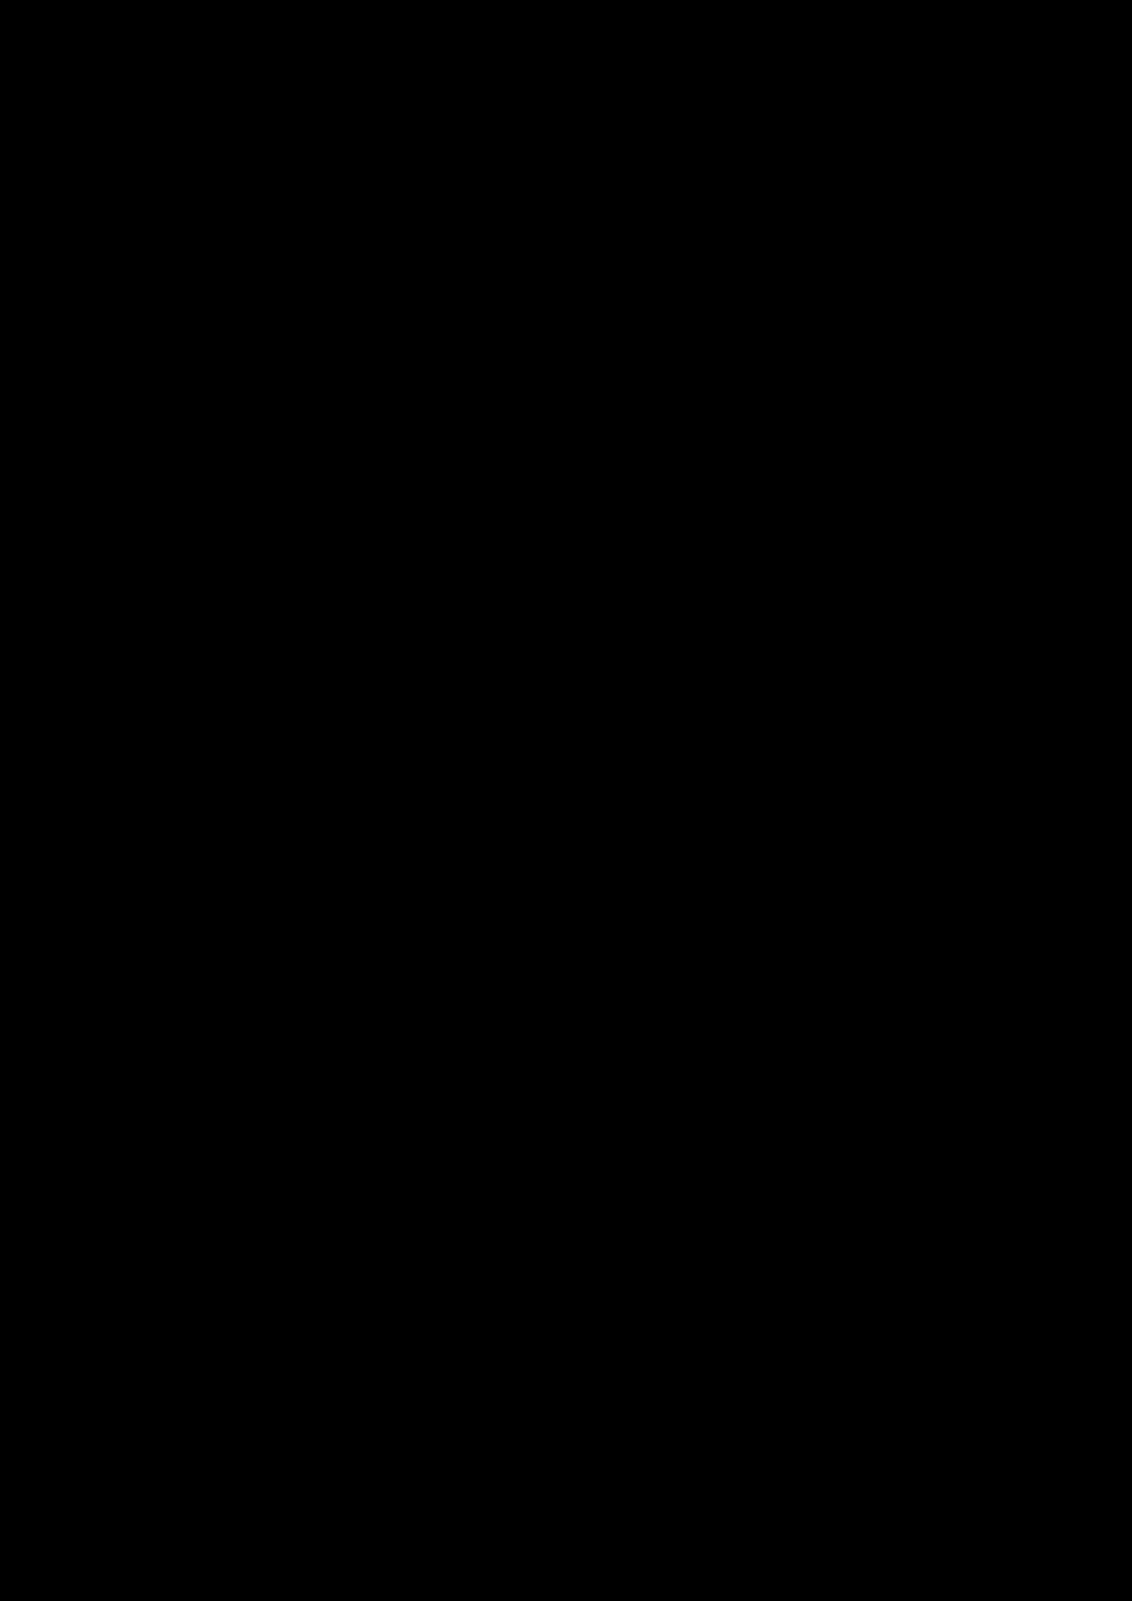 Korolevstvo slez slide, Image 53